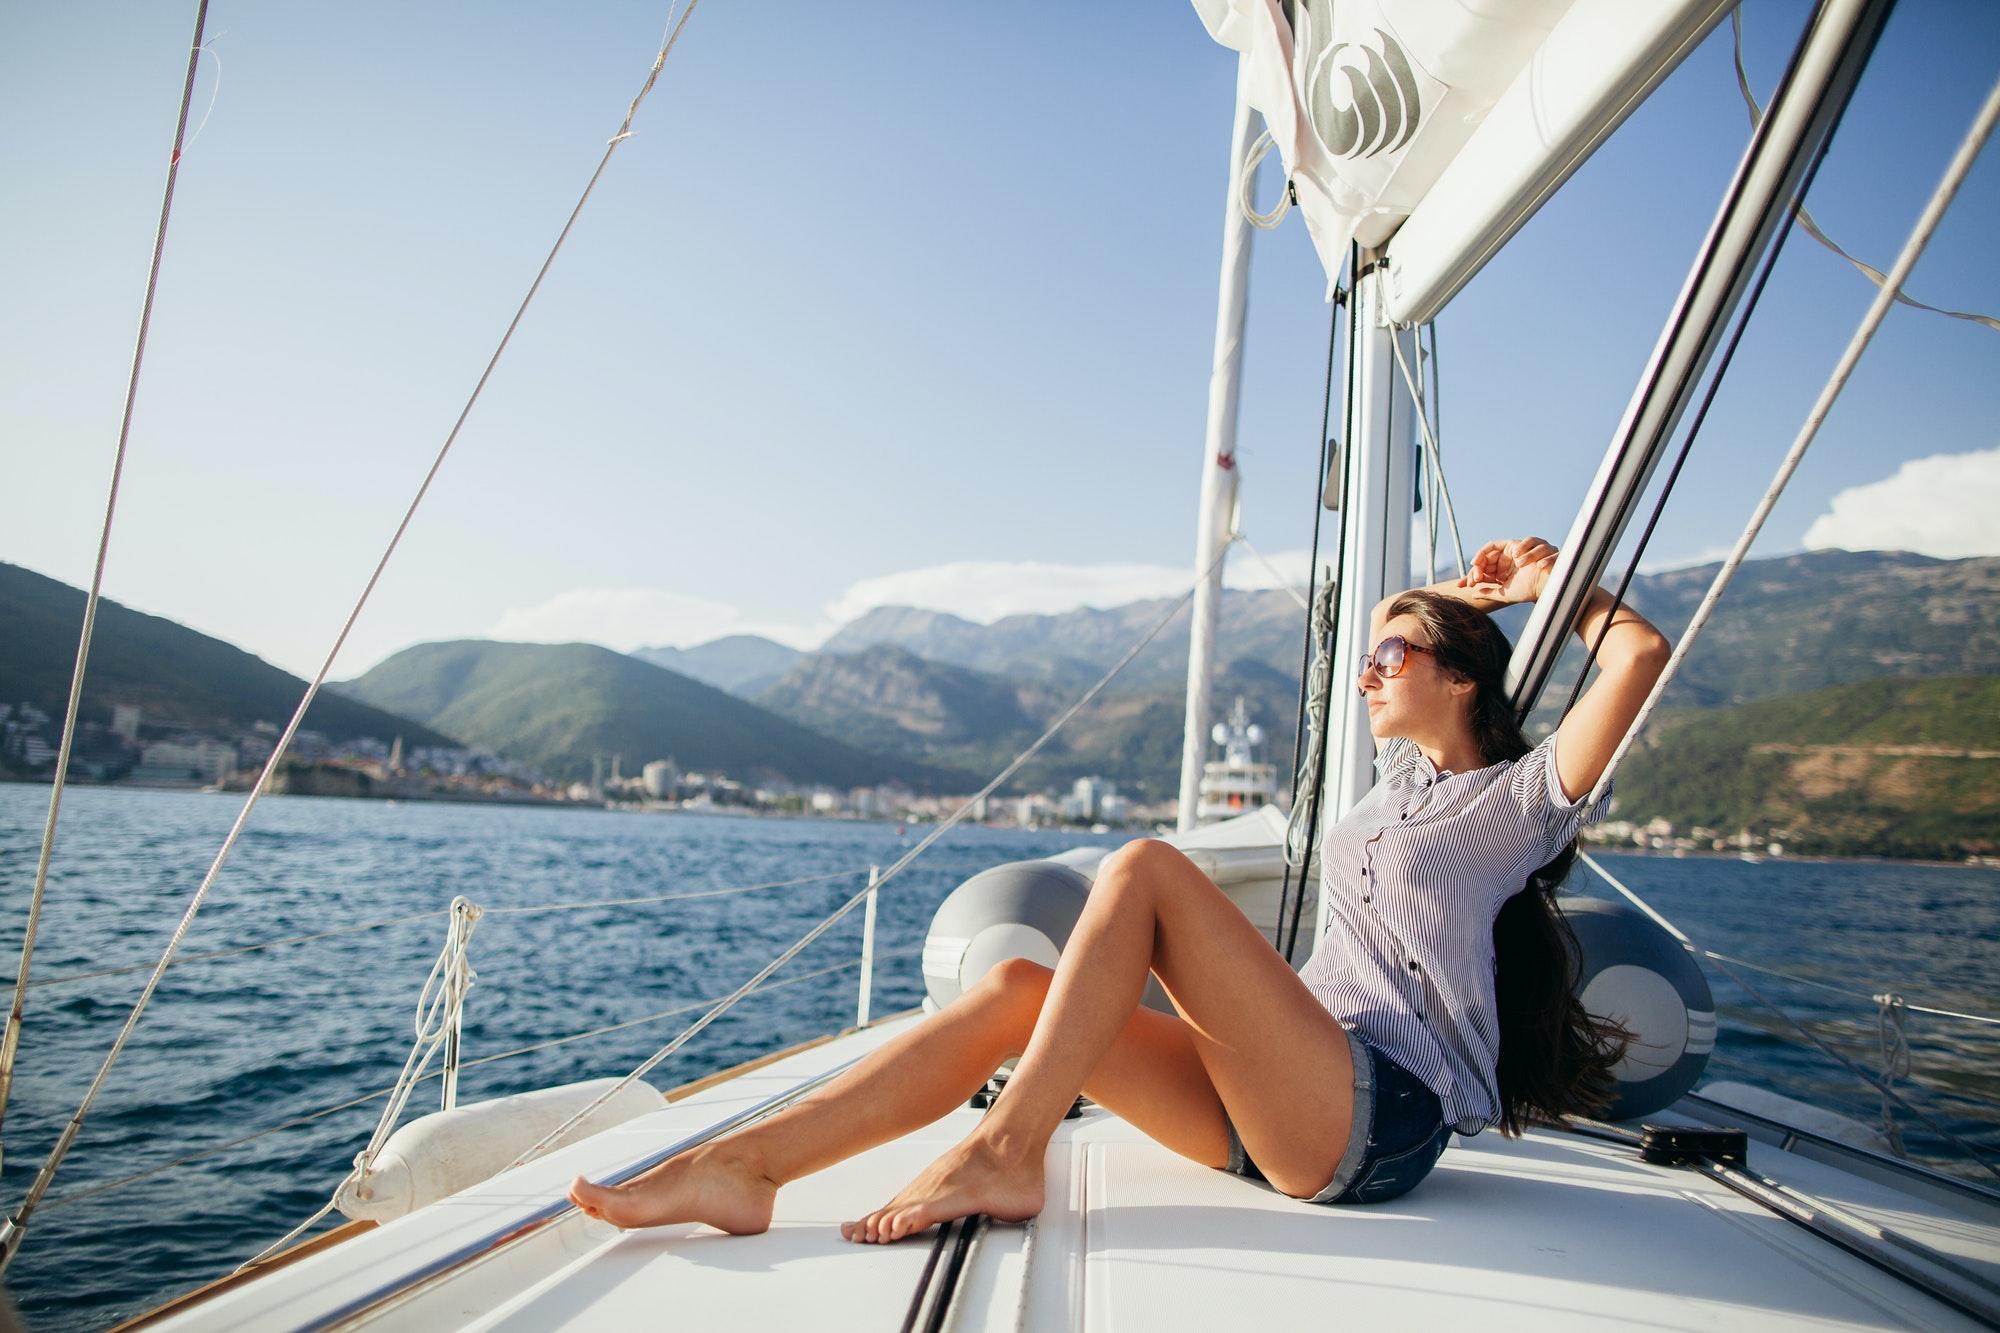 sexy girl in swimwear on yacht in tropics